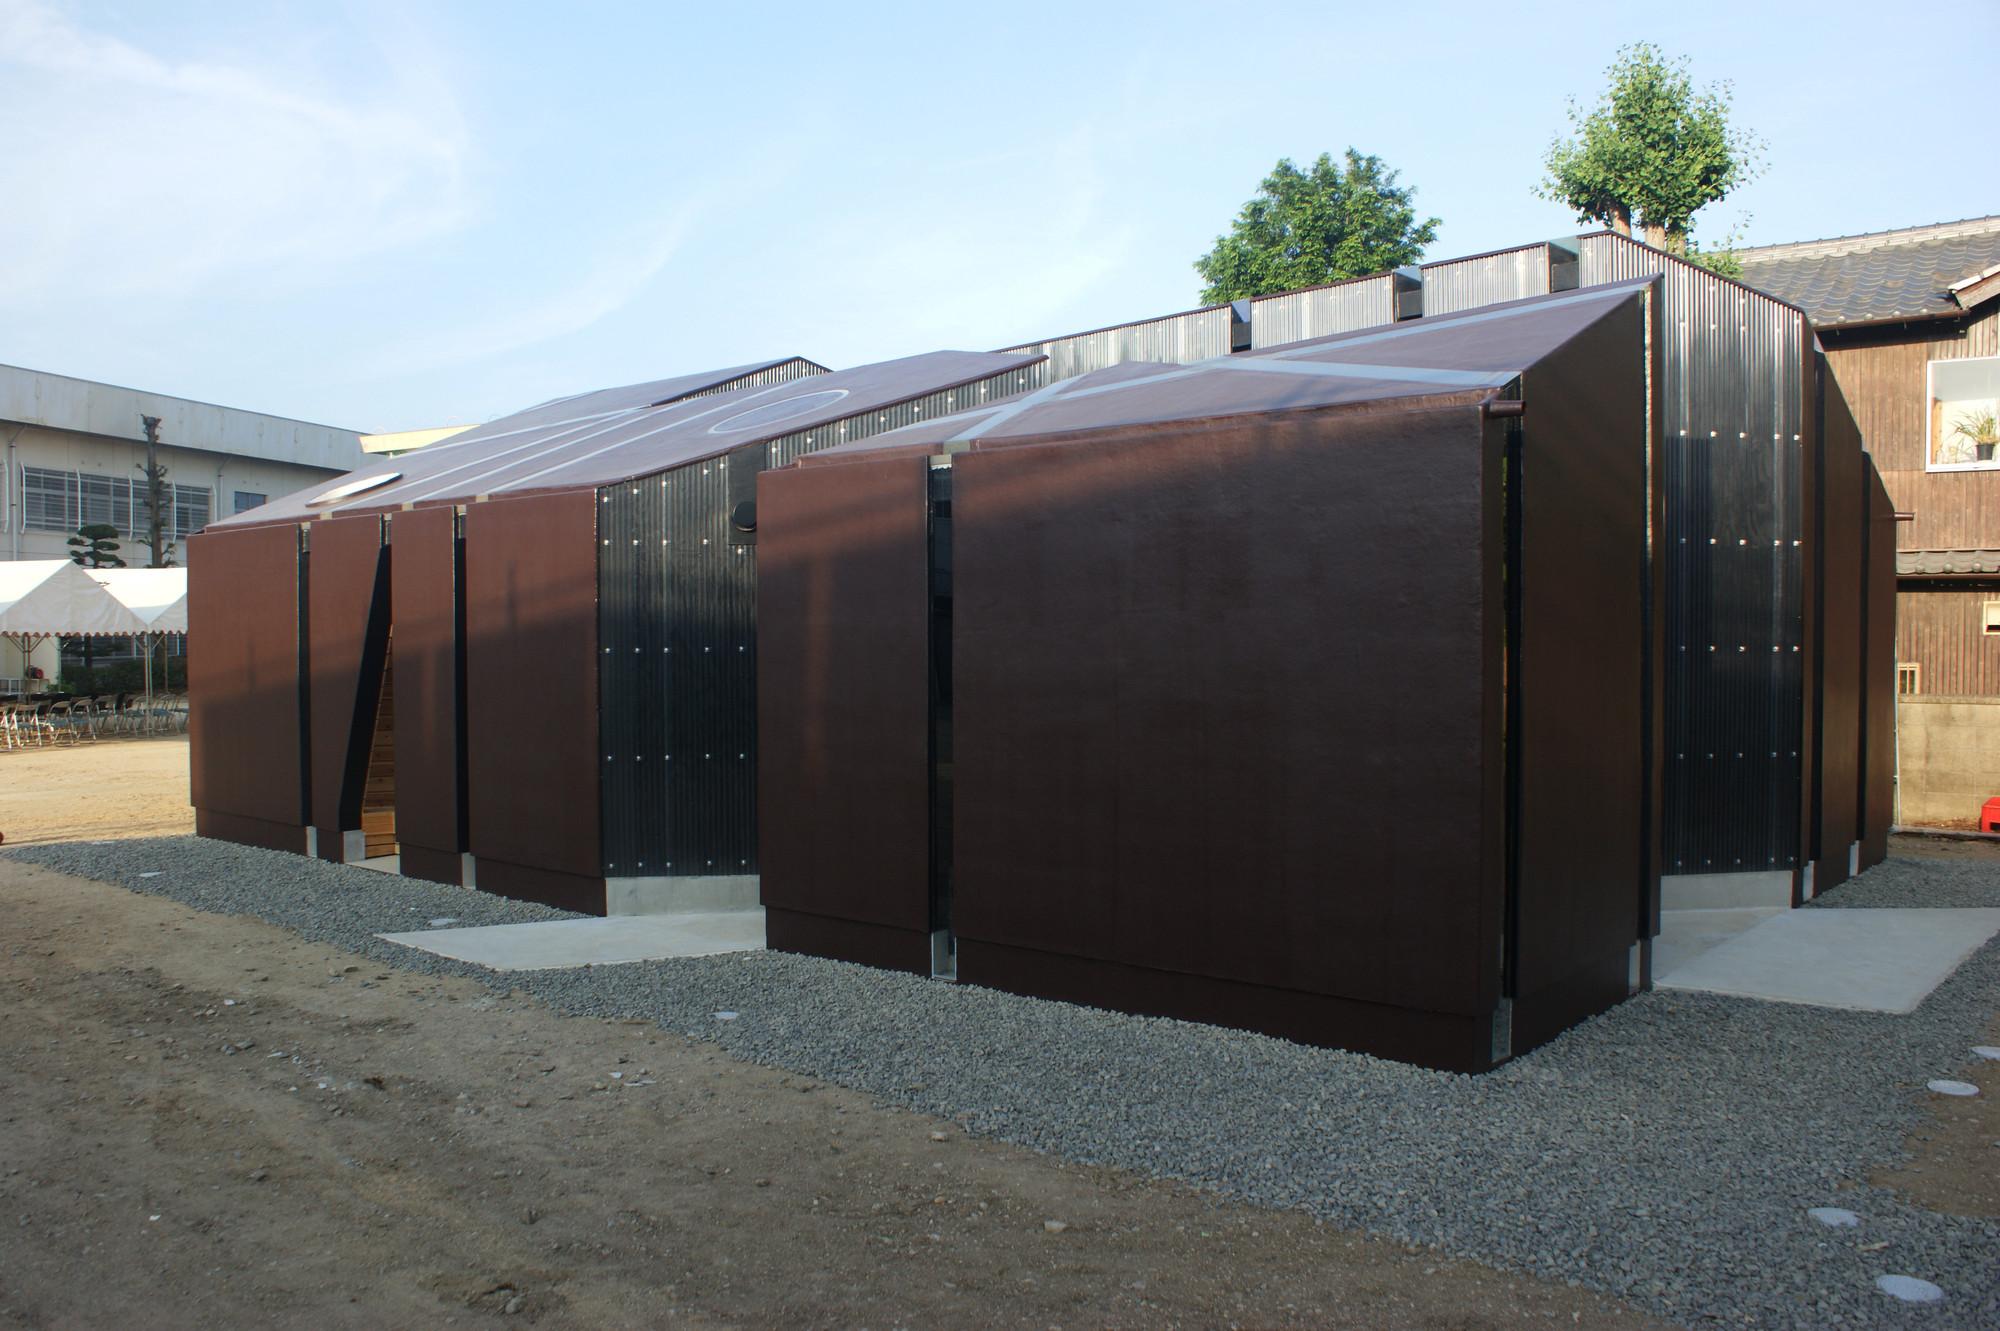 Gallery of House of Toilet / Daigo Ishii + Future-scape ...